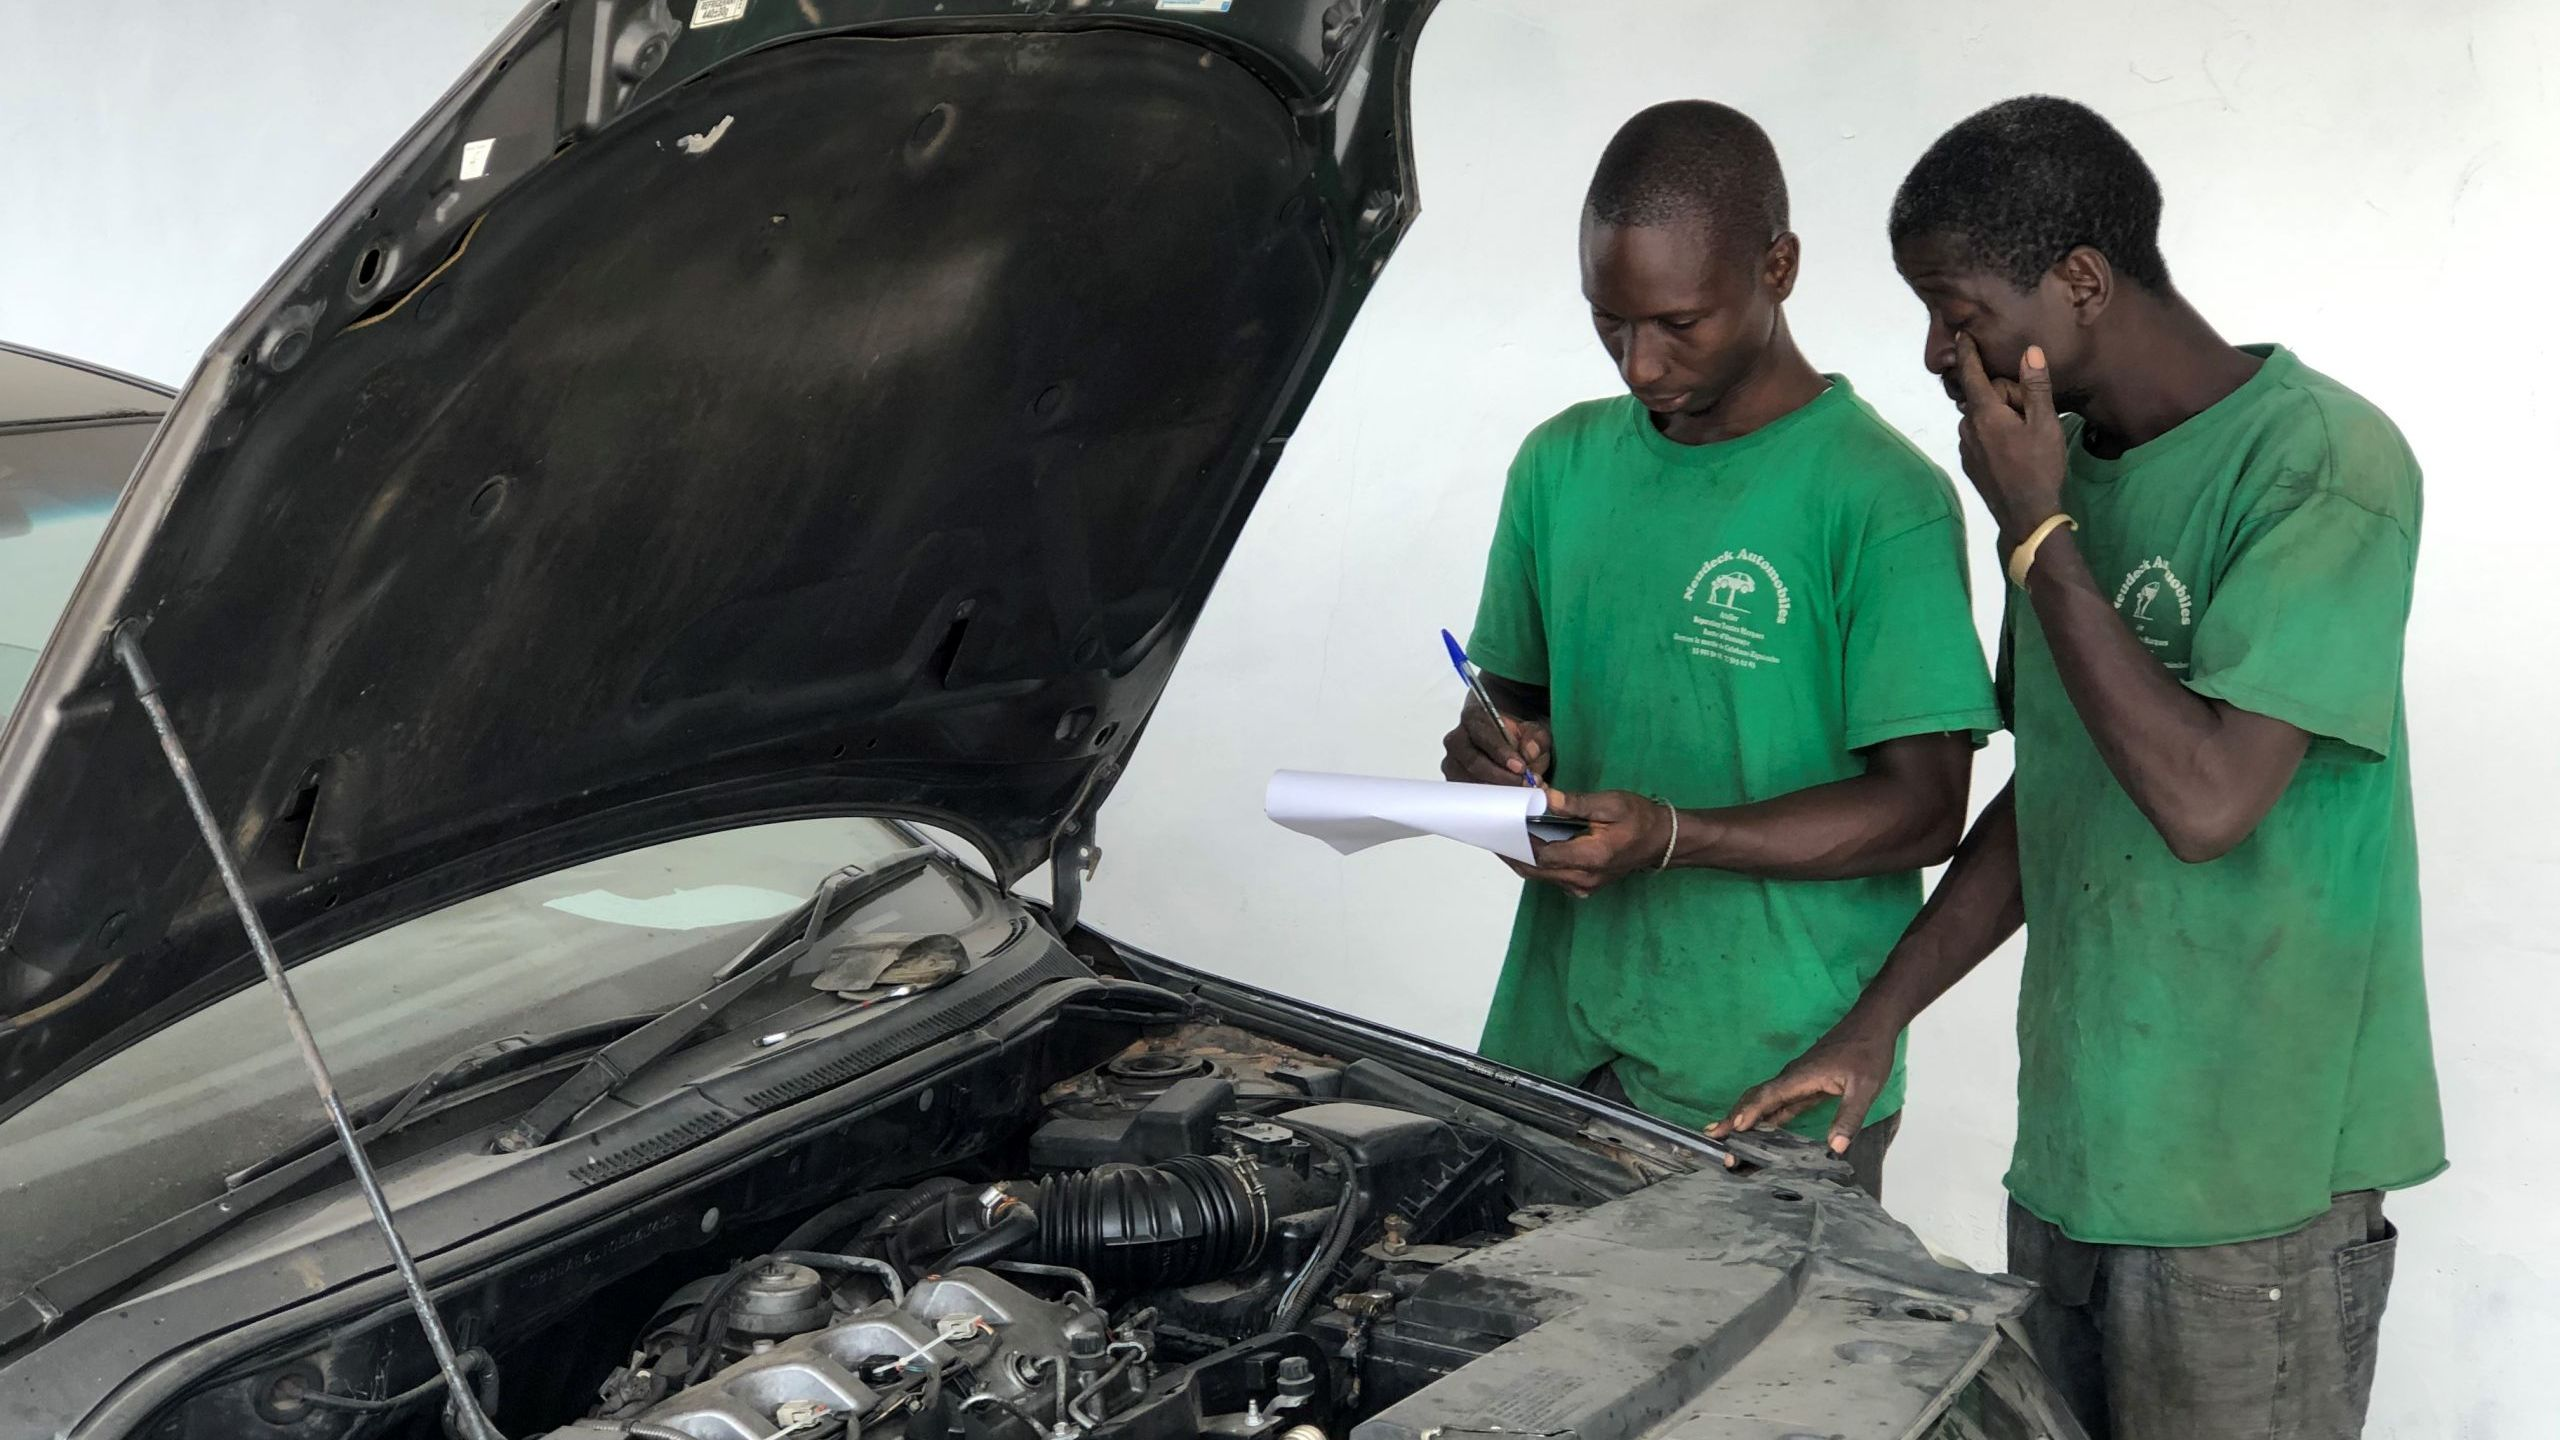 Mechatroniker L. Mendy erklärt Auszubildendem A.Sambou Fahrzeugelektronik